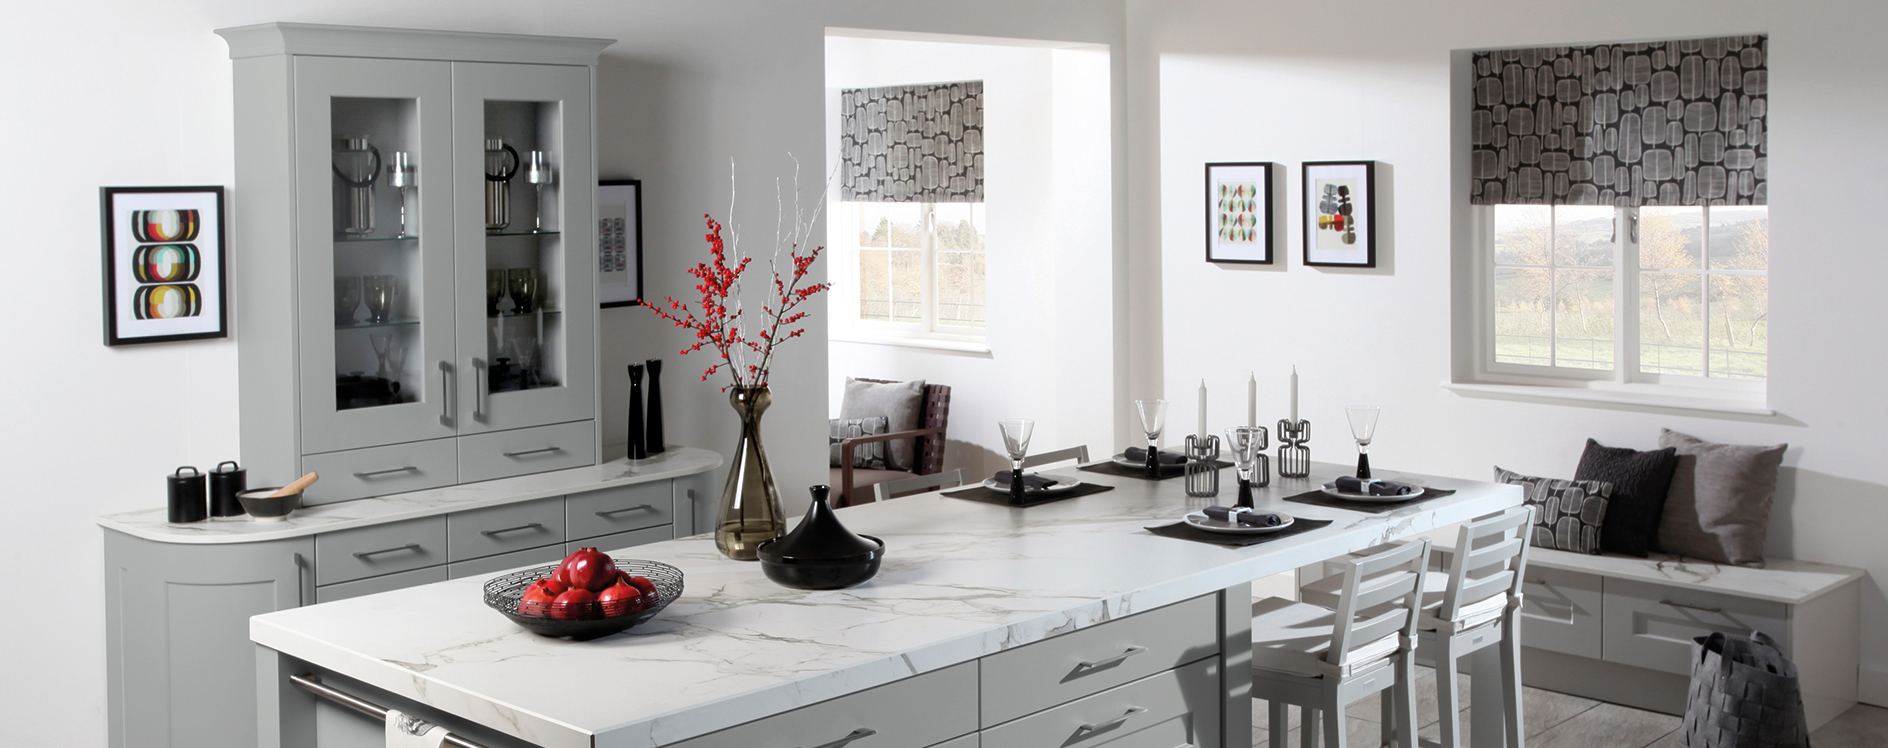 Burbidge Burbidge Stowe Painted Kitchen Kitchen